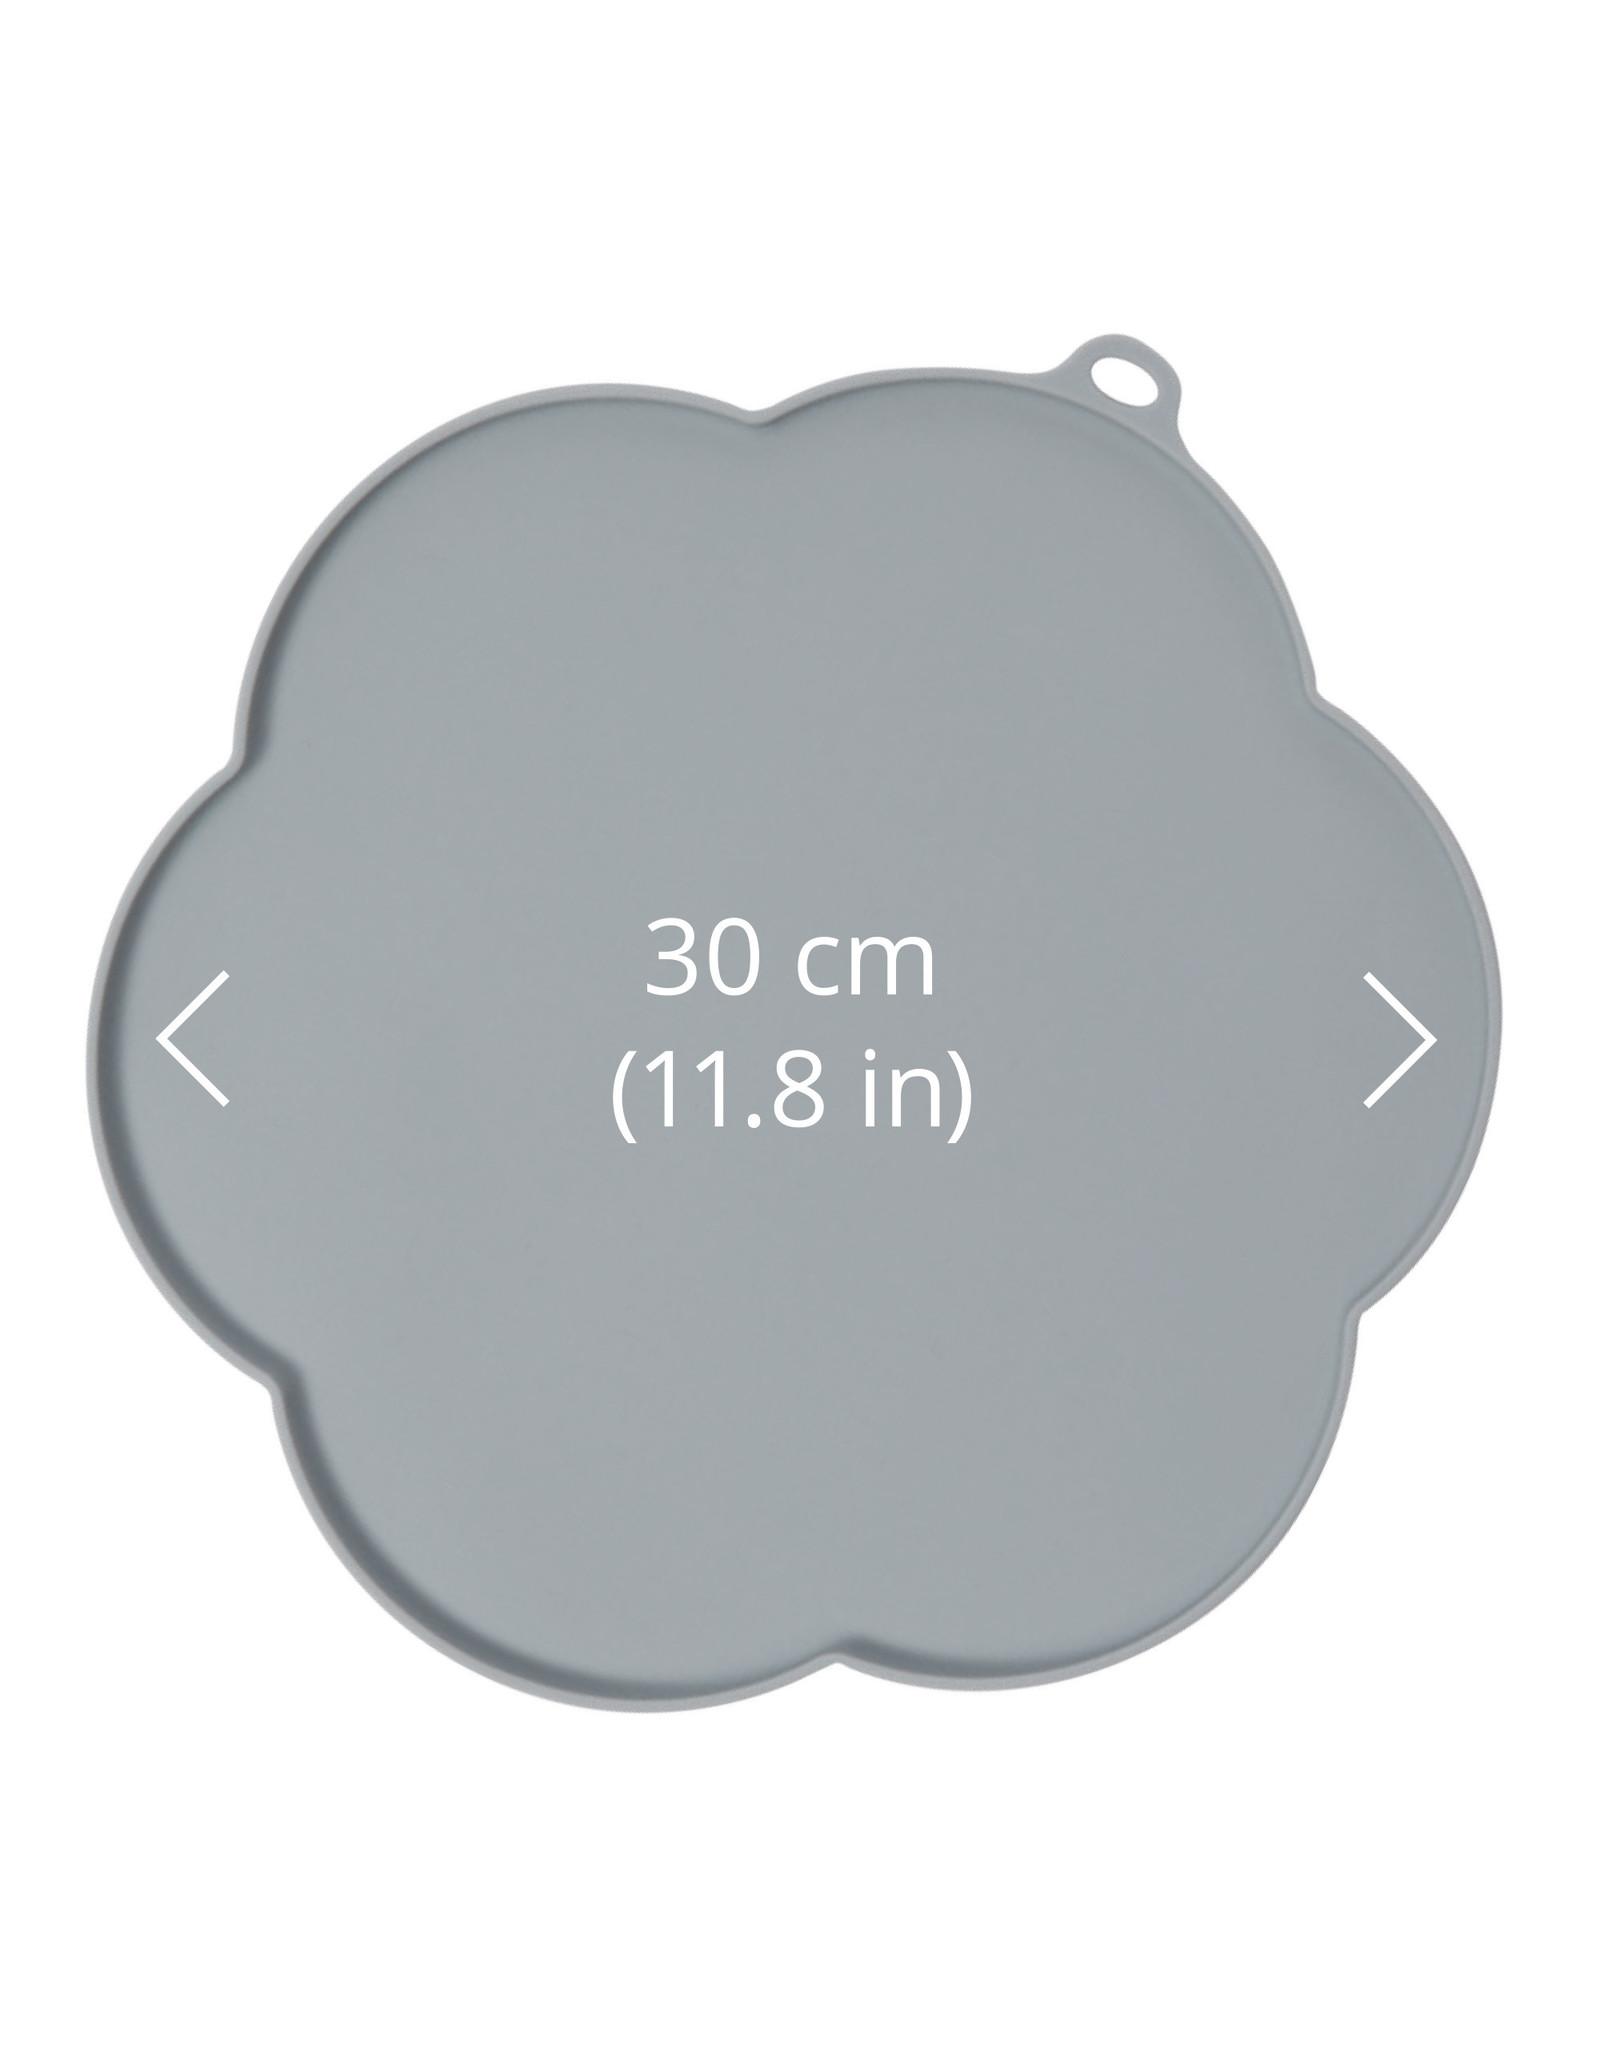 CatIt Flower Placemat Grey